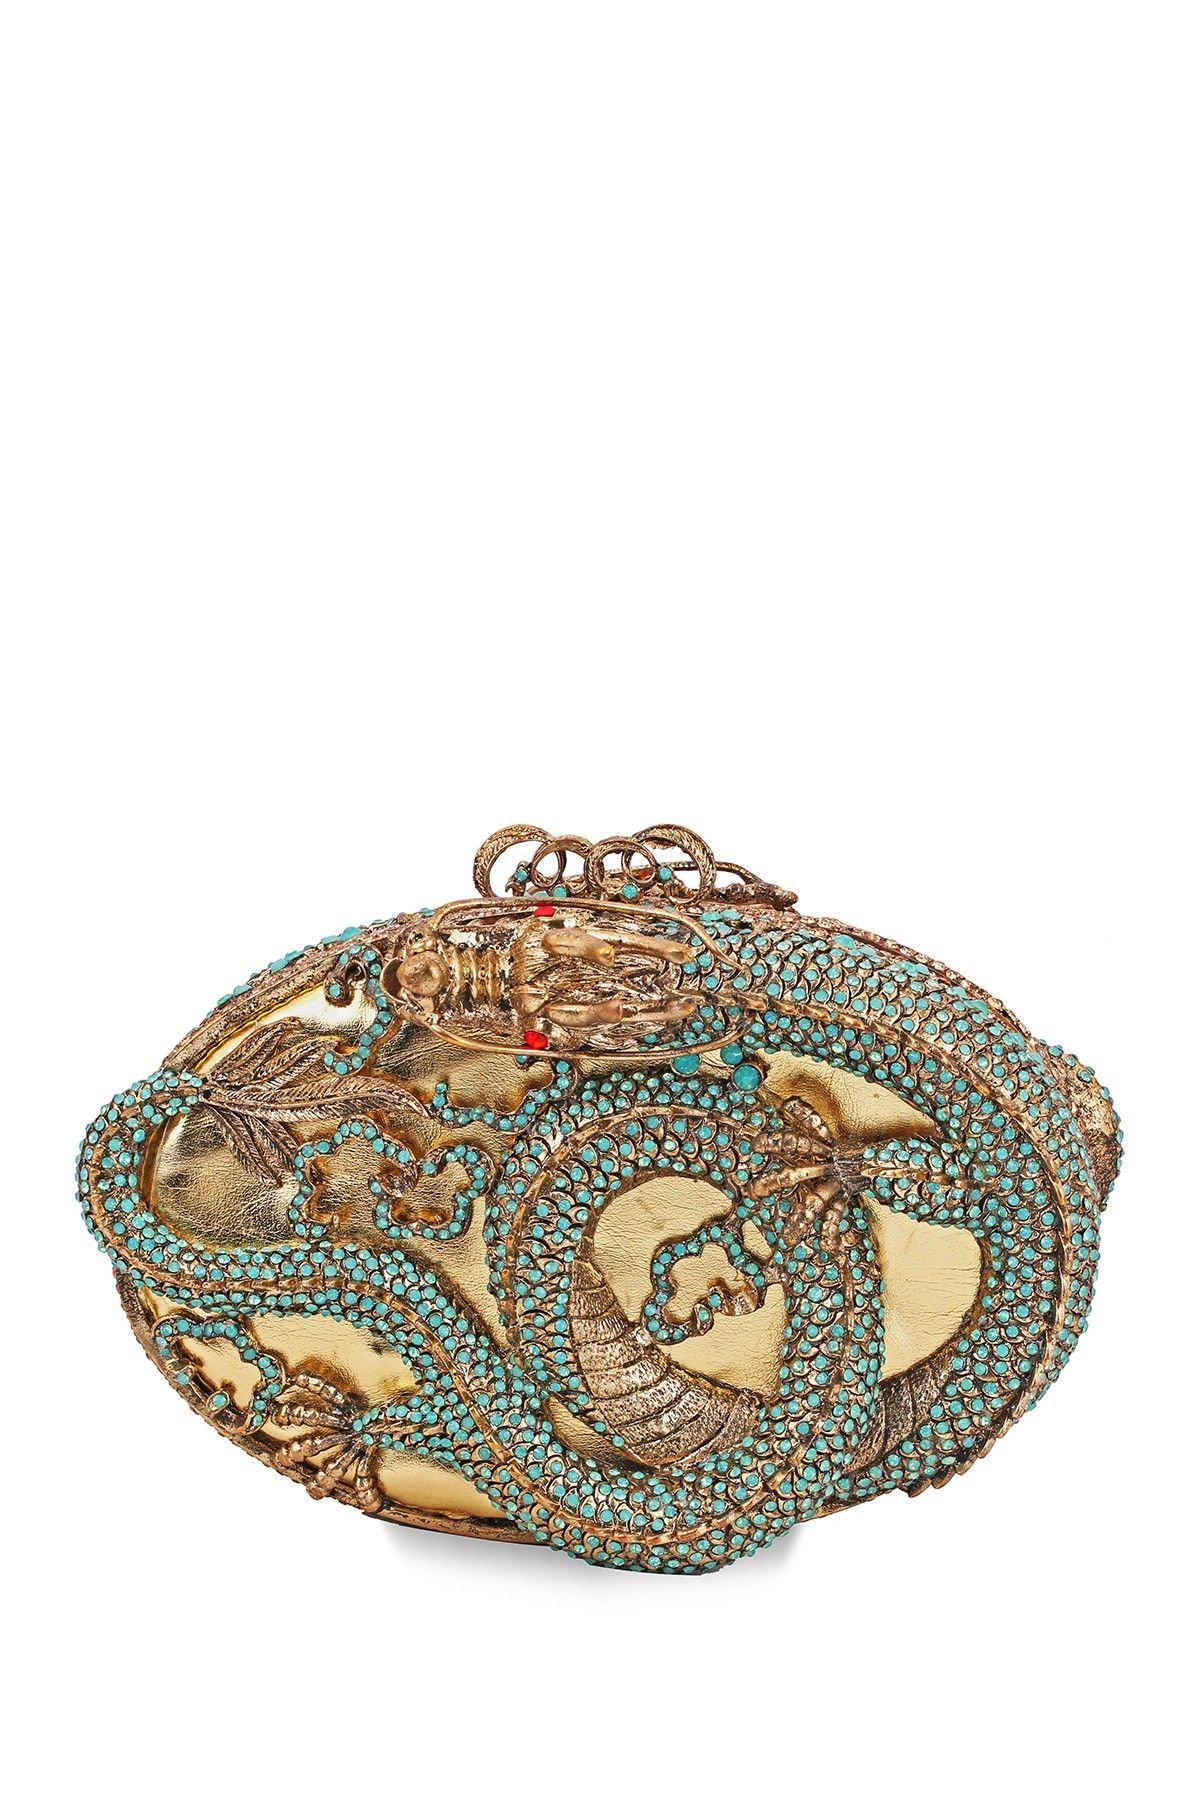 Bansri | Les Dragonne Jeweled Clutch | HauteLook